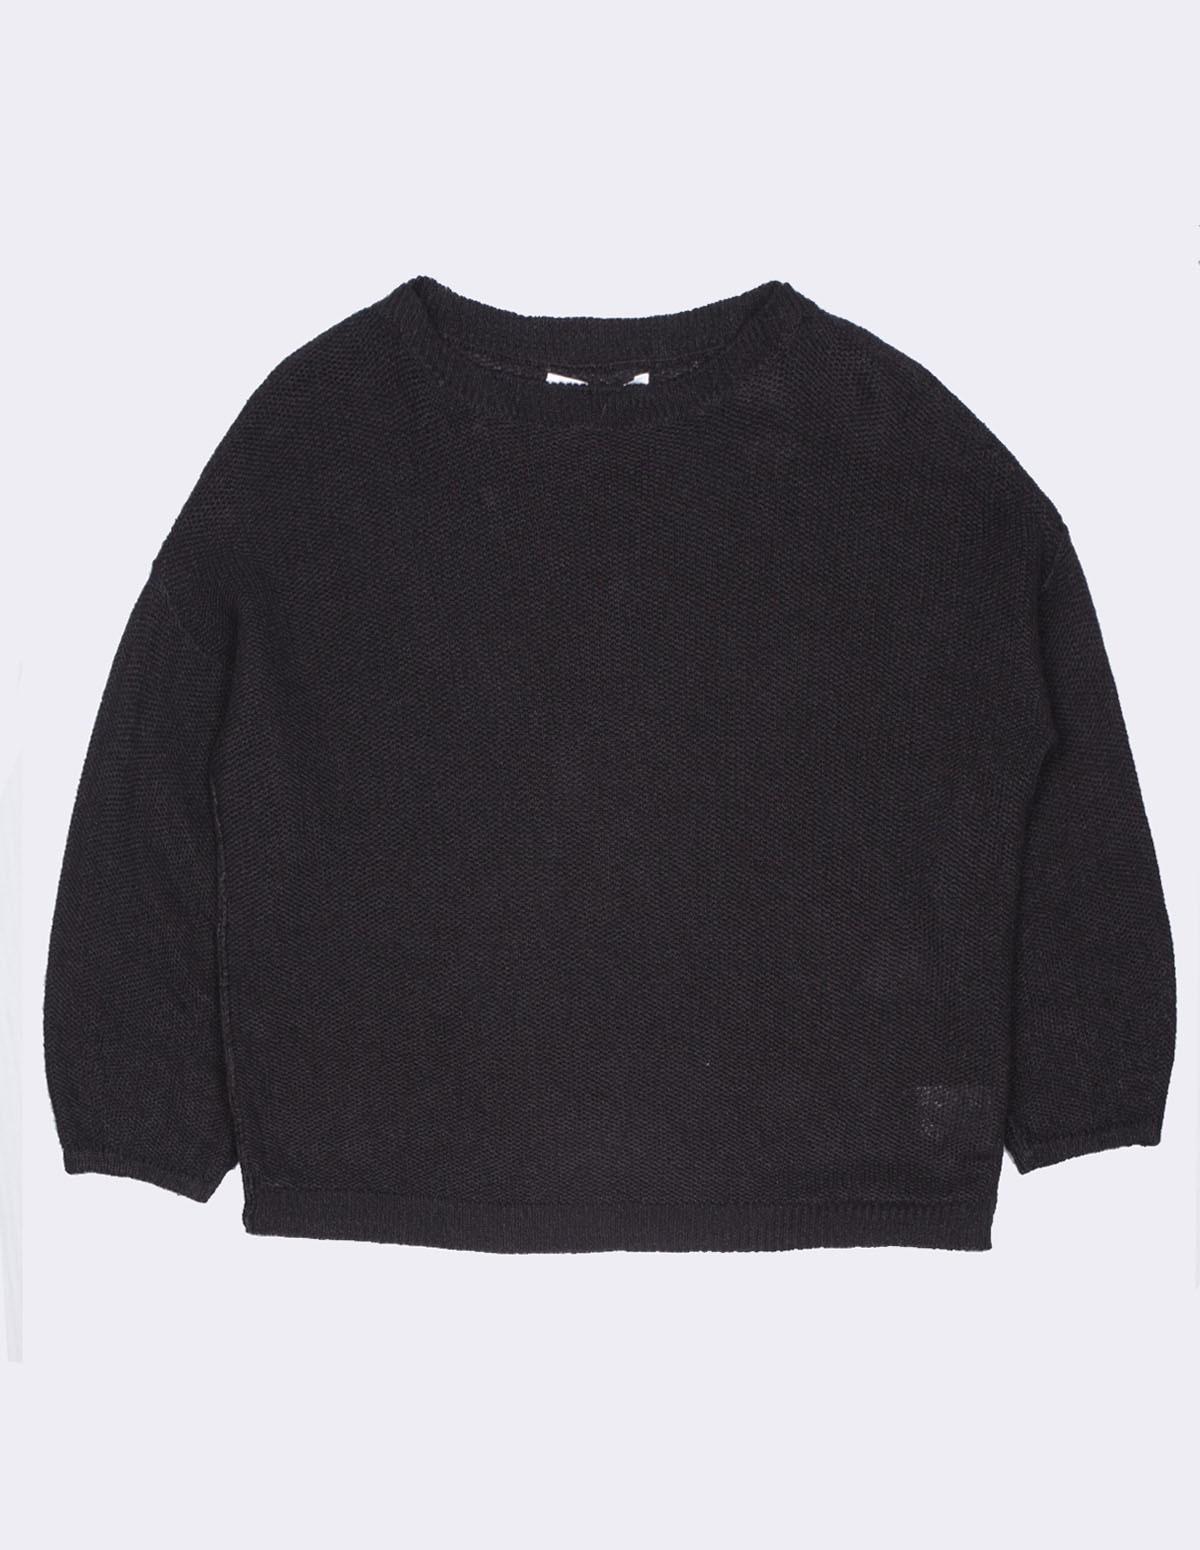 Pom 8289/75102 Pull - BLACK 99